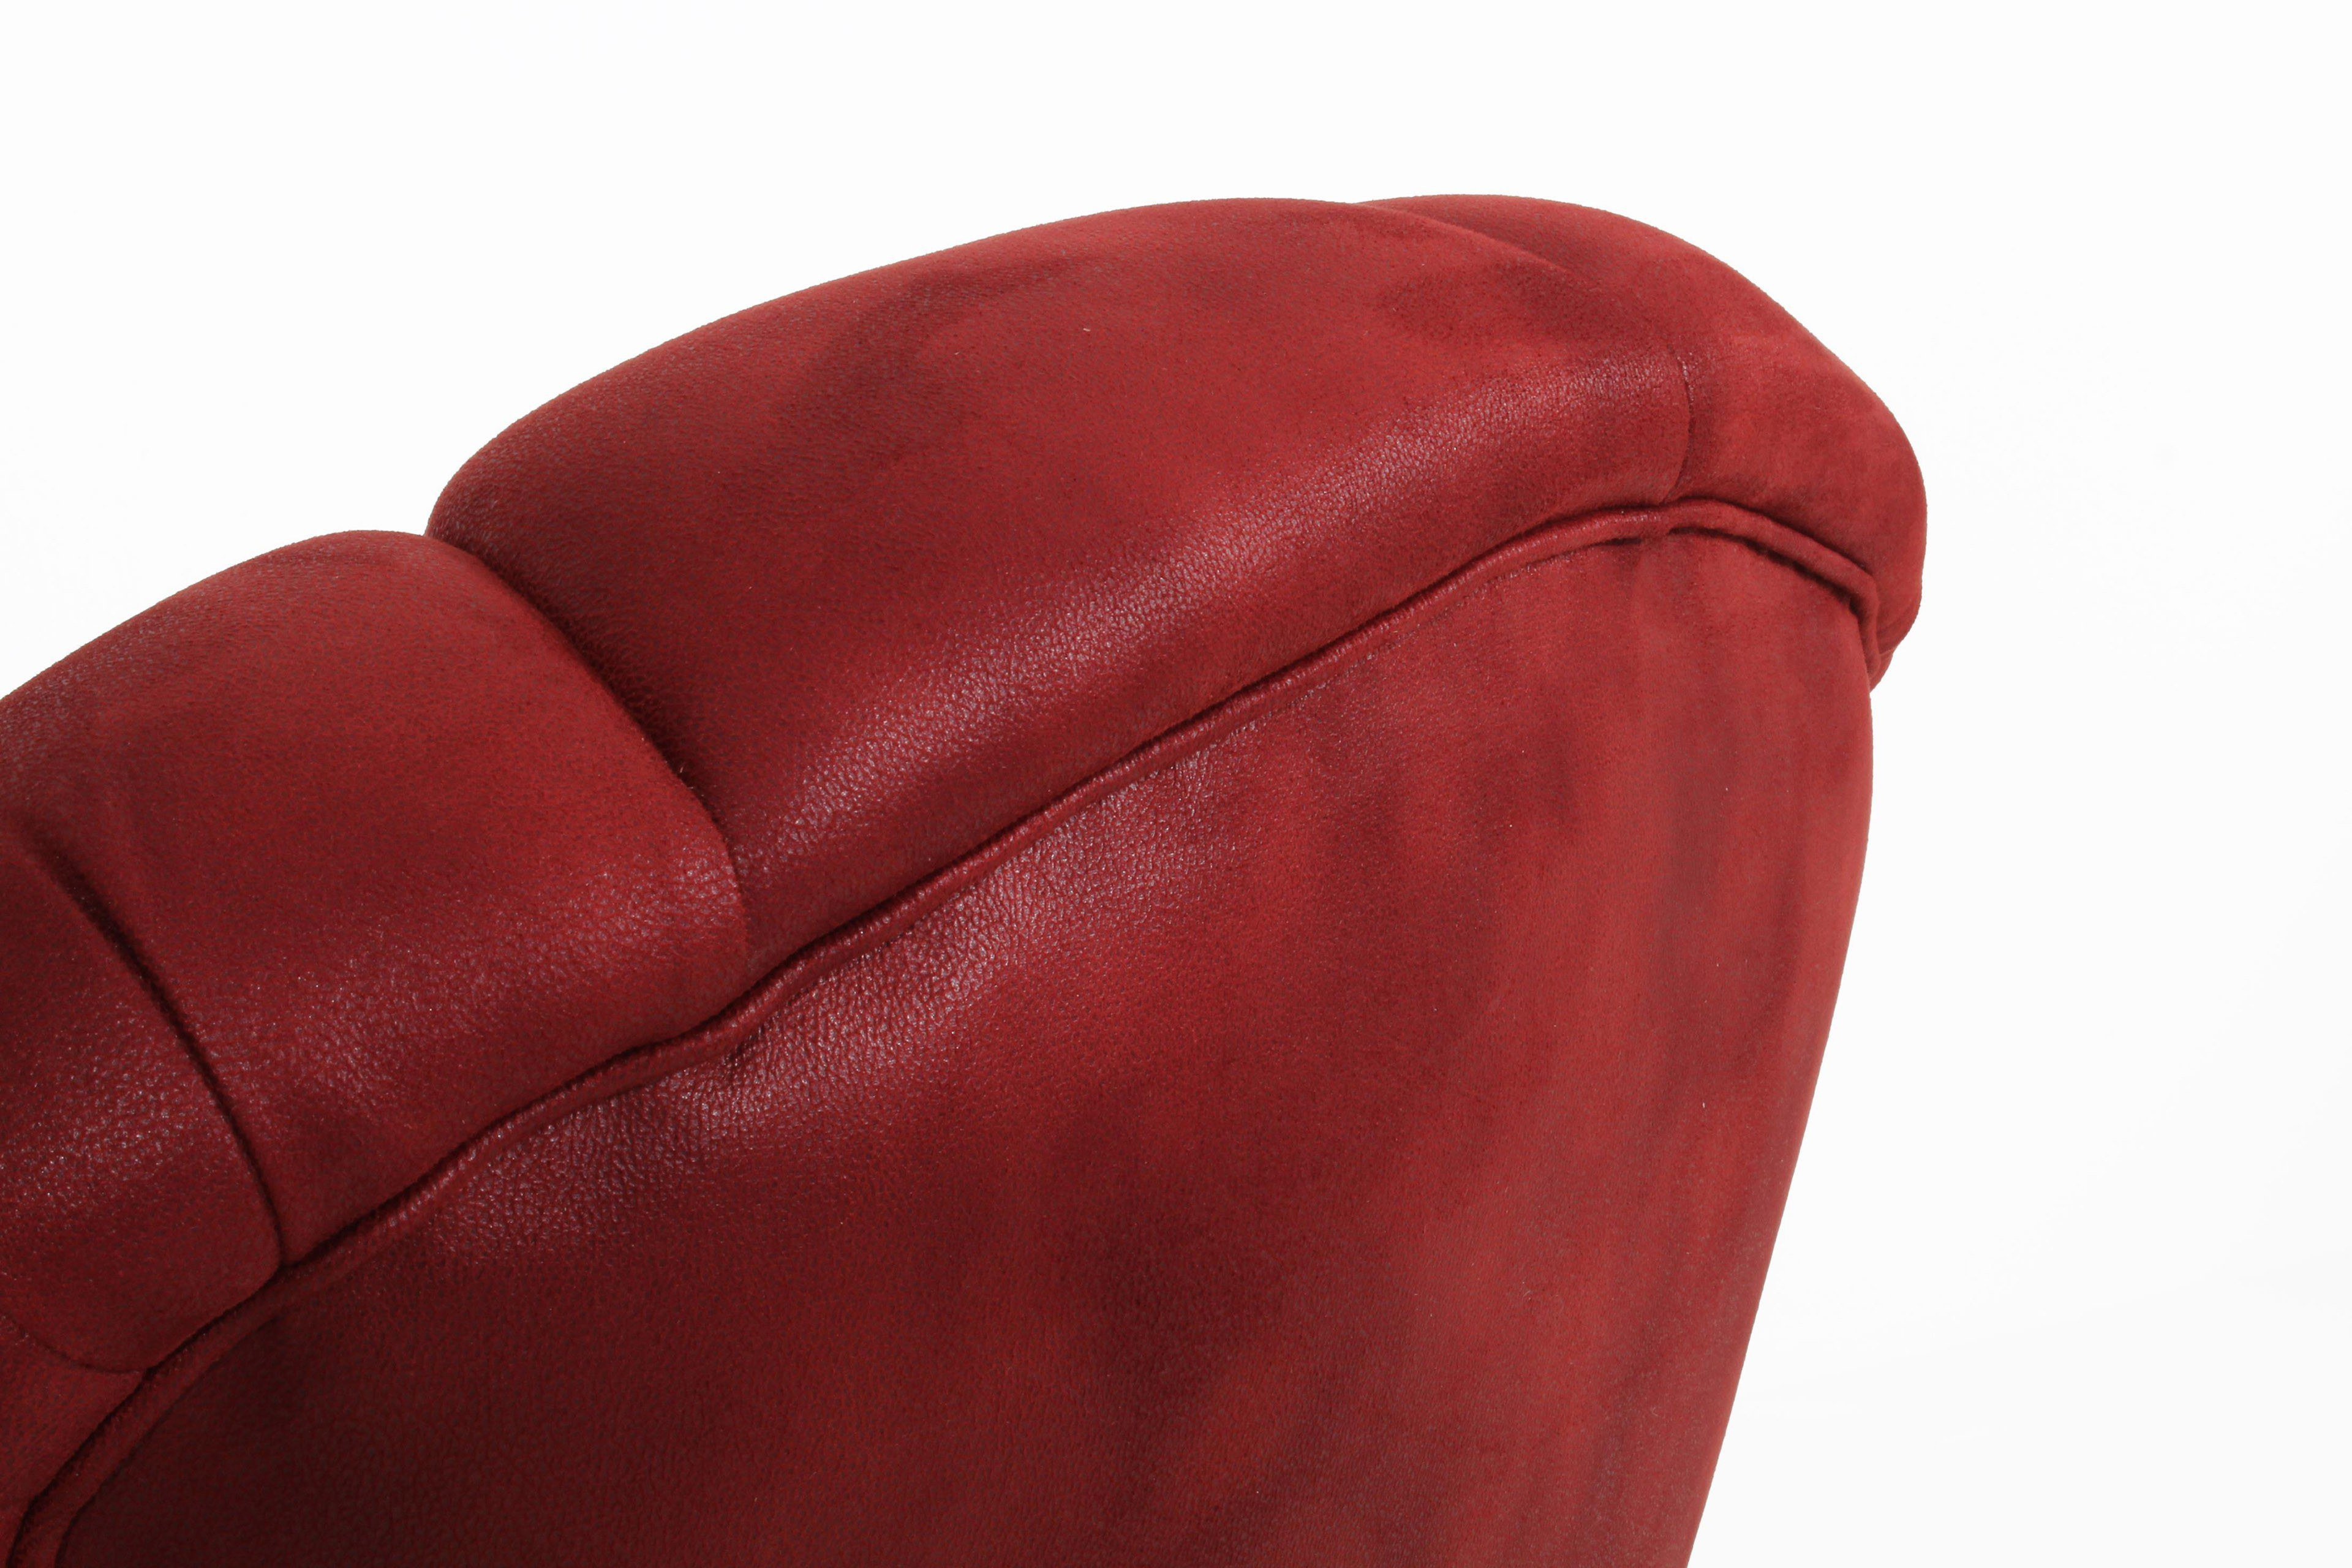 max winzer camilla sessel in rot m bel letz ihr online shop. Black Bedroom Furniture Sets. Home Design Ideas